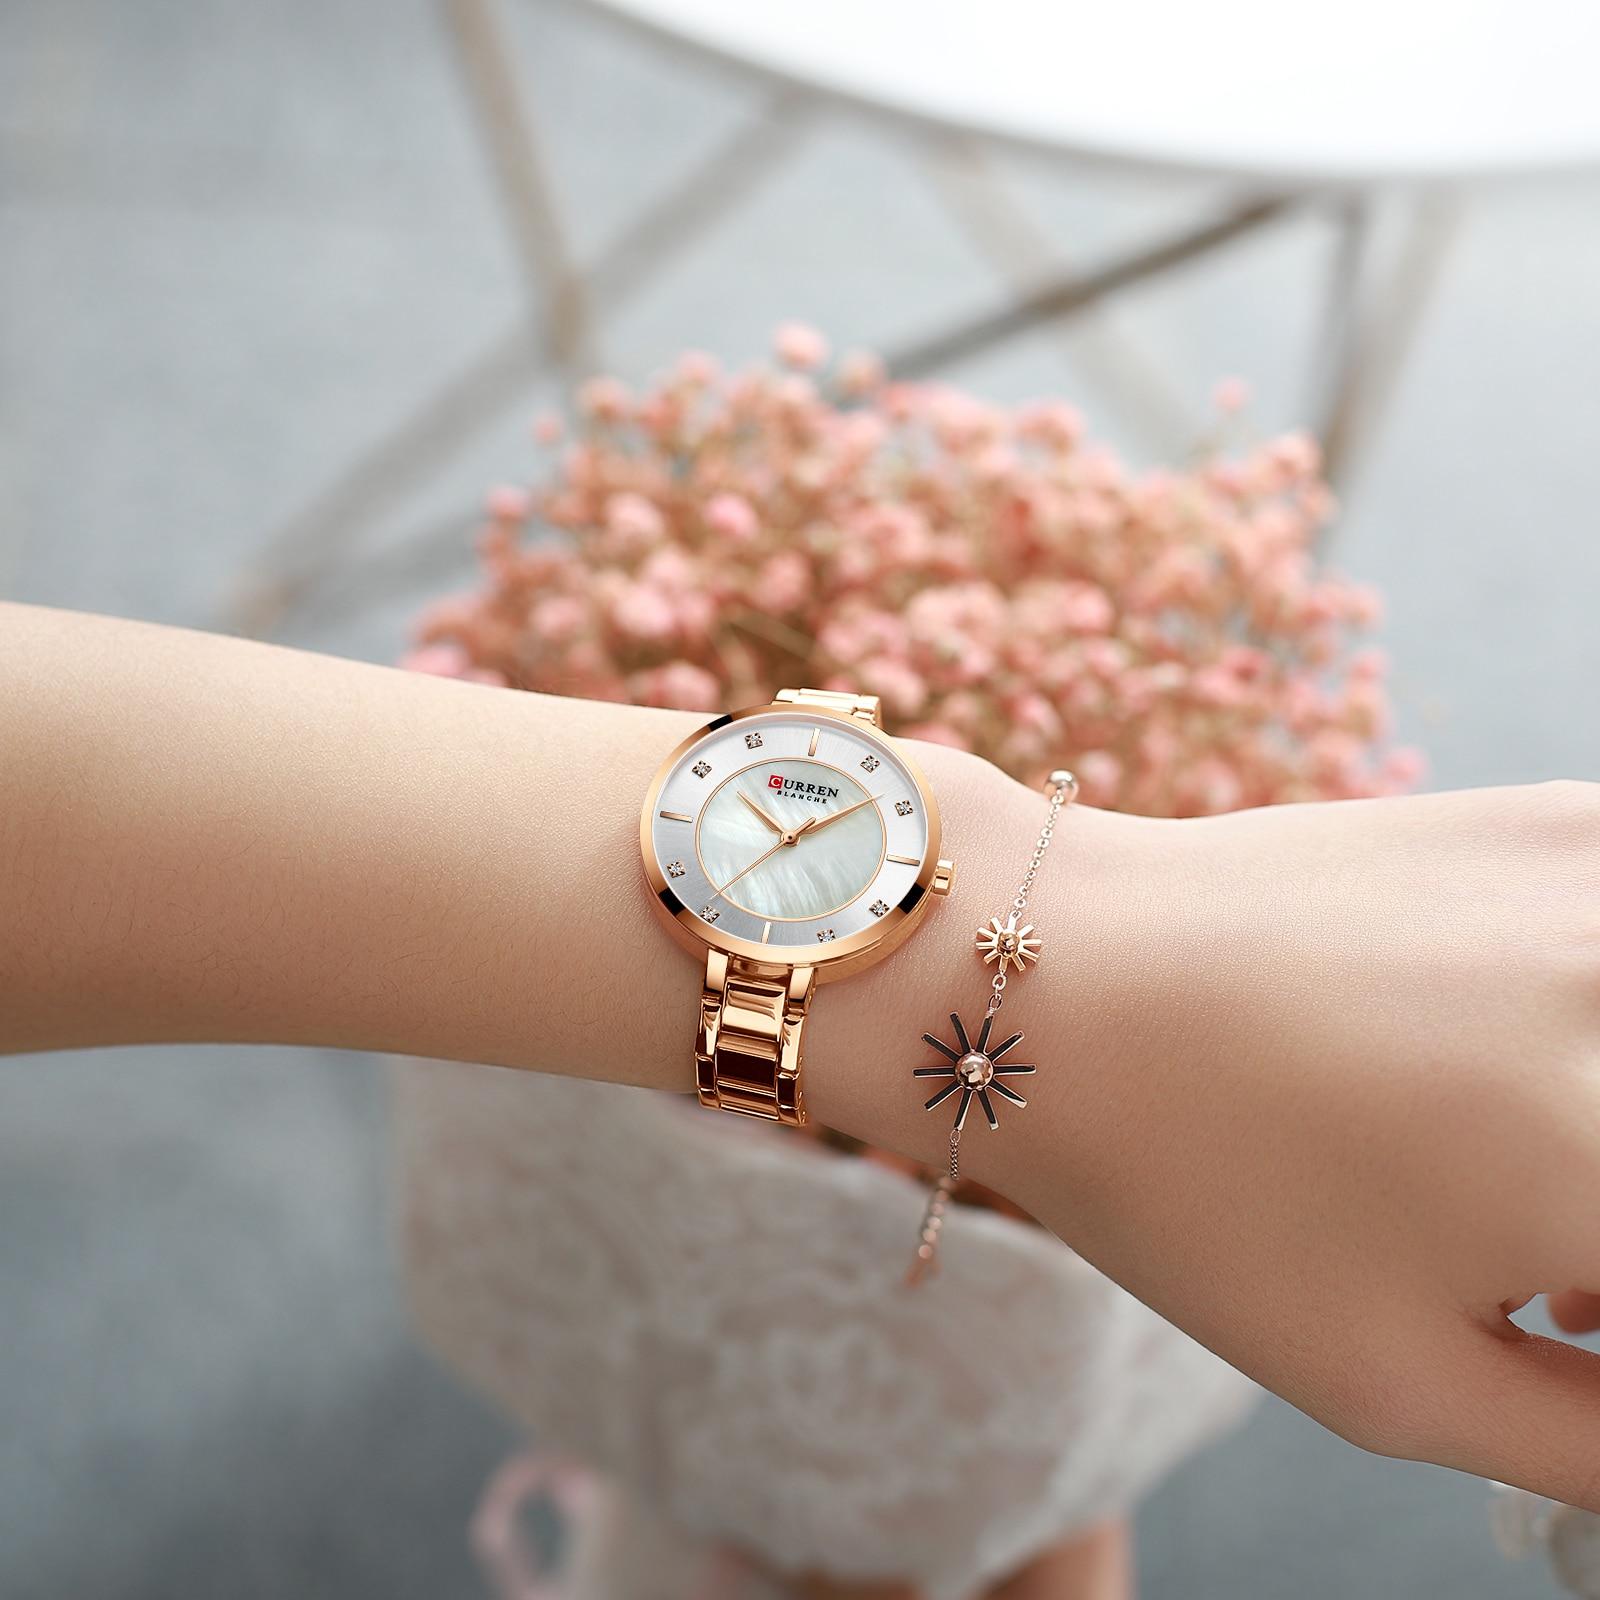 CURREN Elegant Women Watch Rose Gold Slim Crystal Stainless Steel Strap Quartz Fashion Waterproof Female Watches Relogio Feminin enlarge